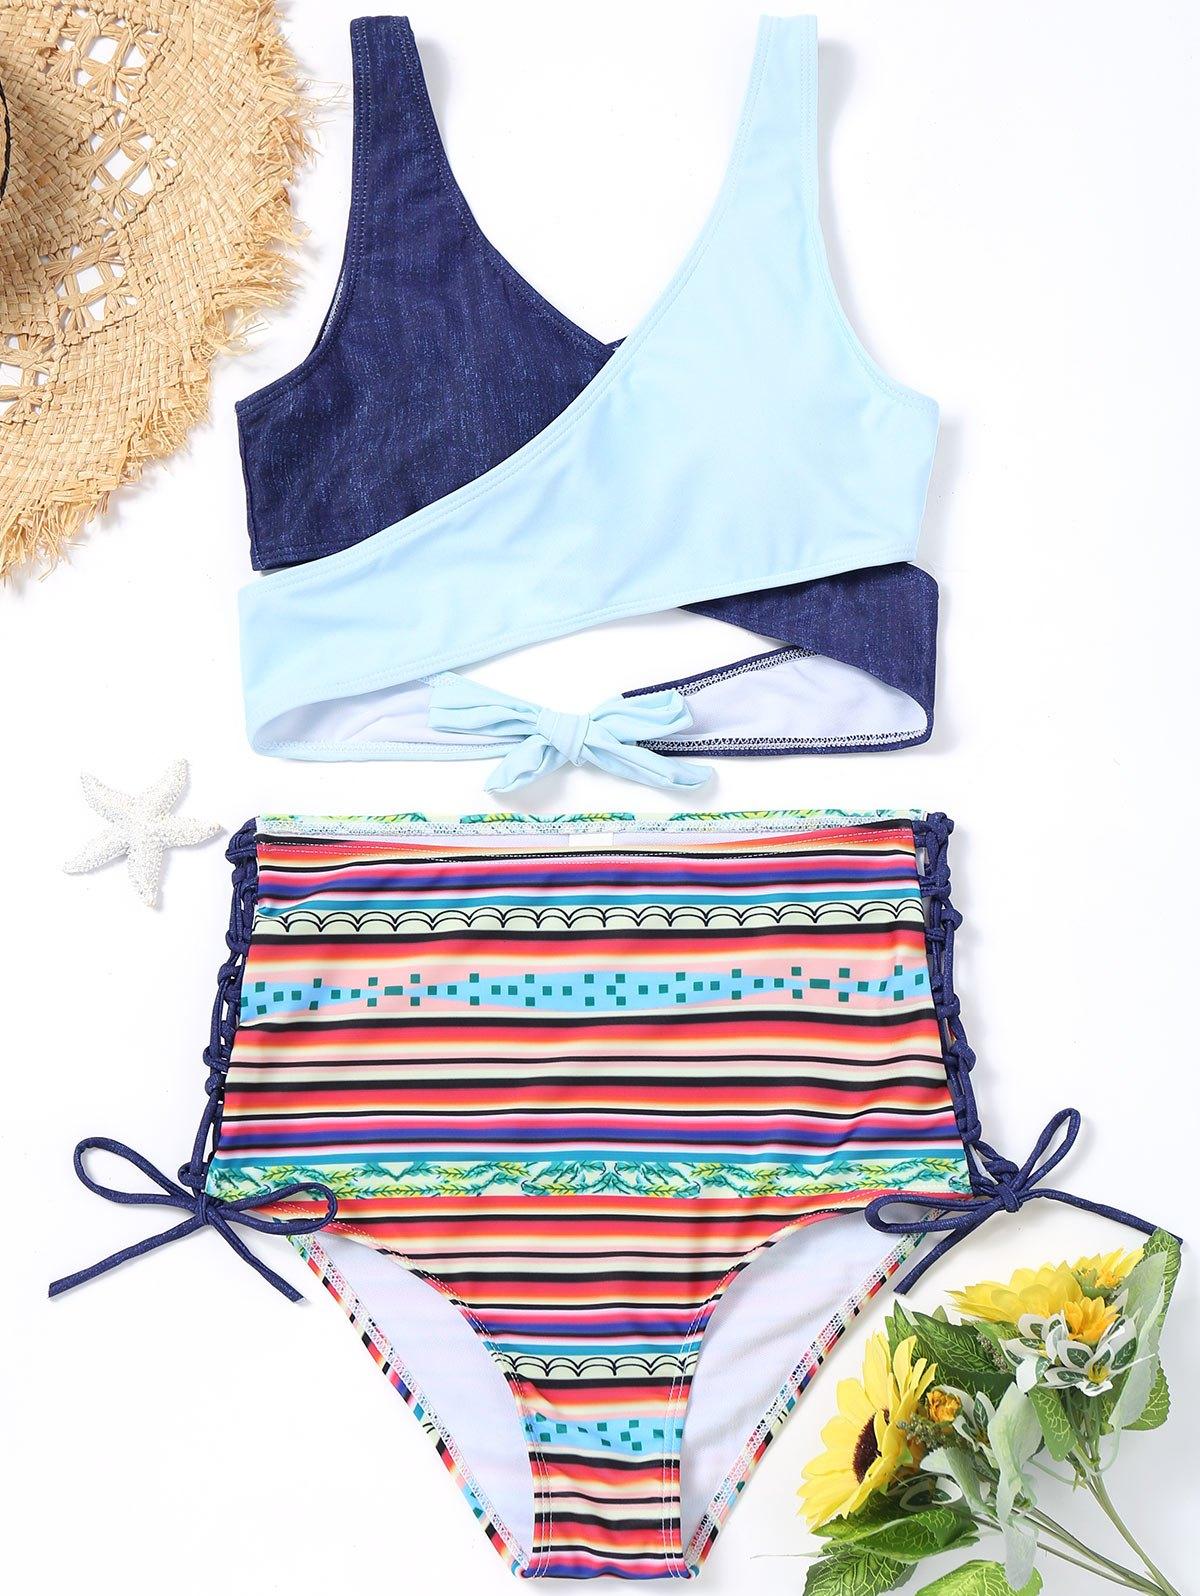 Wrap Bikini Top with Printed High Waisted Bottoms 244881601